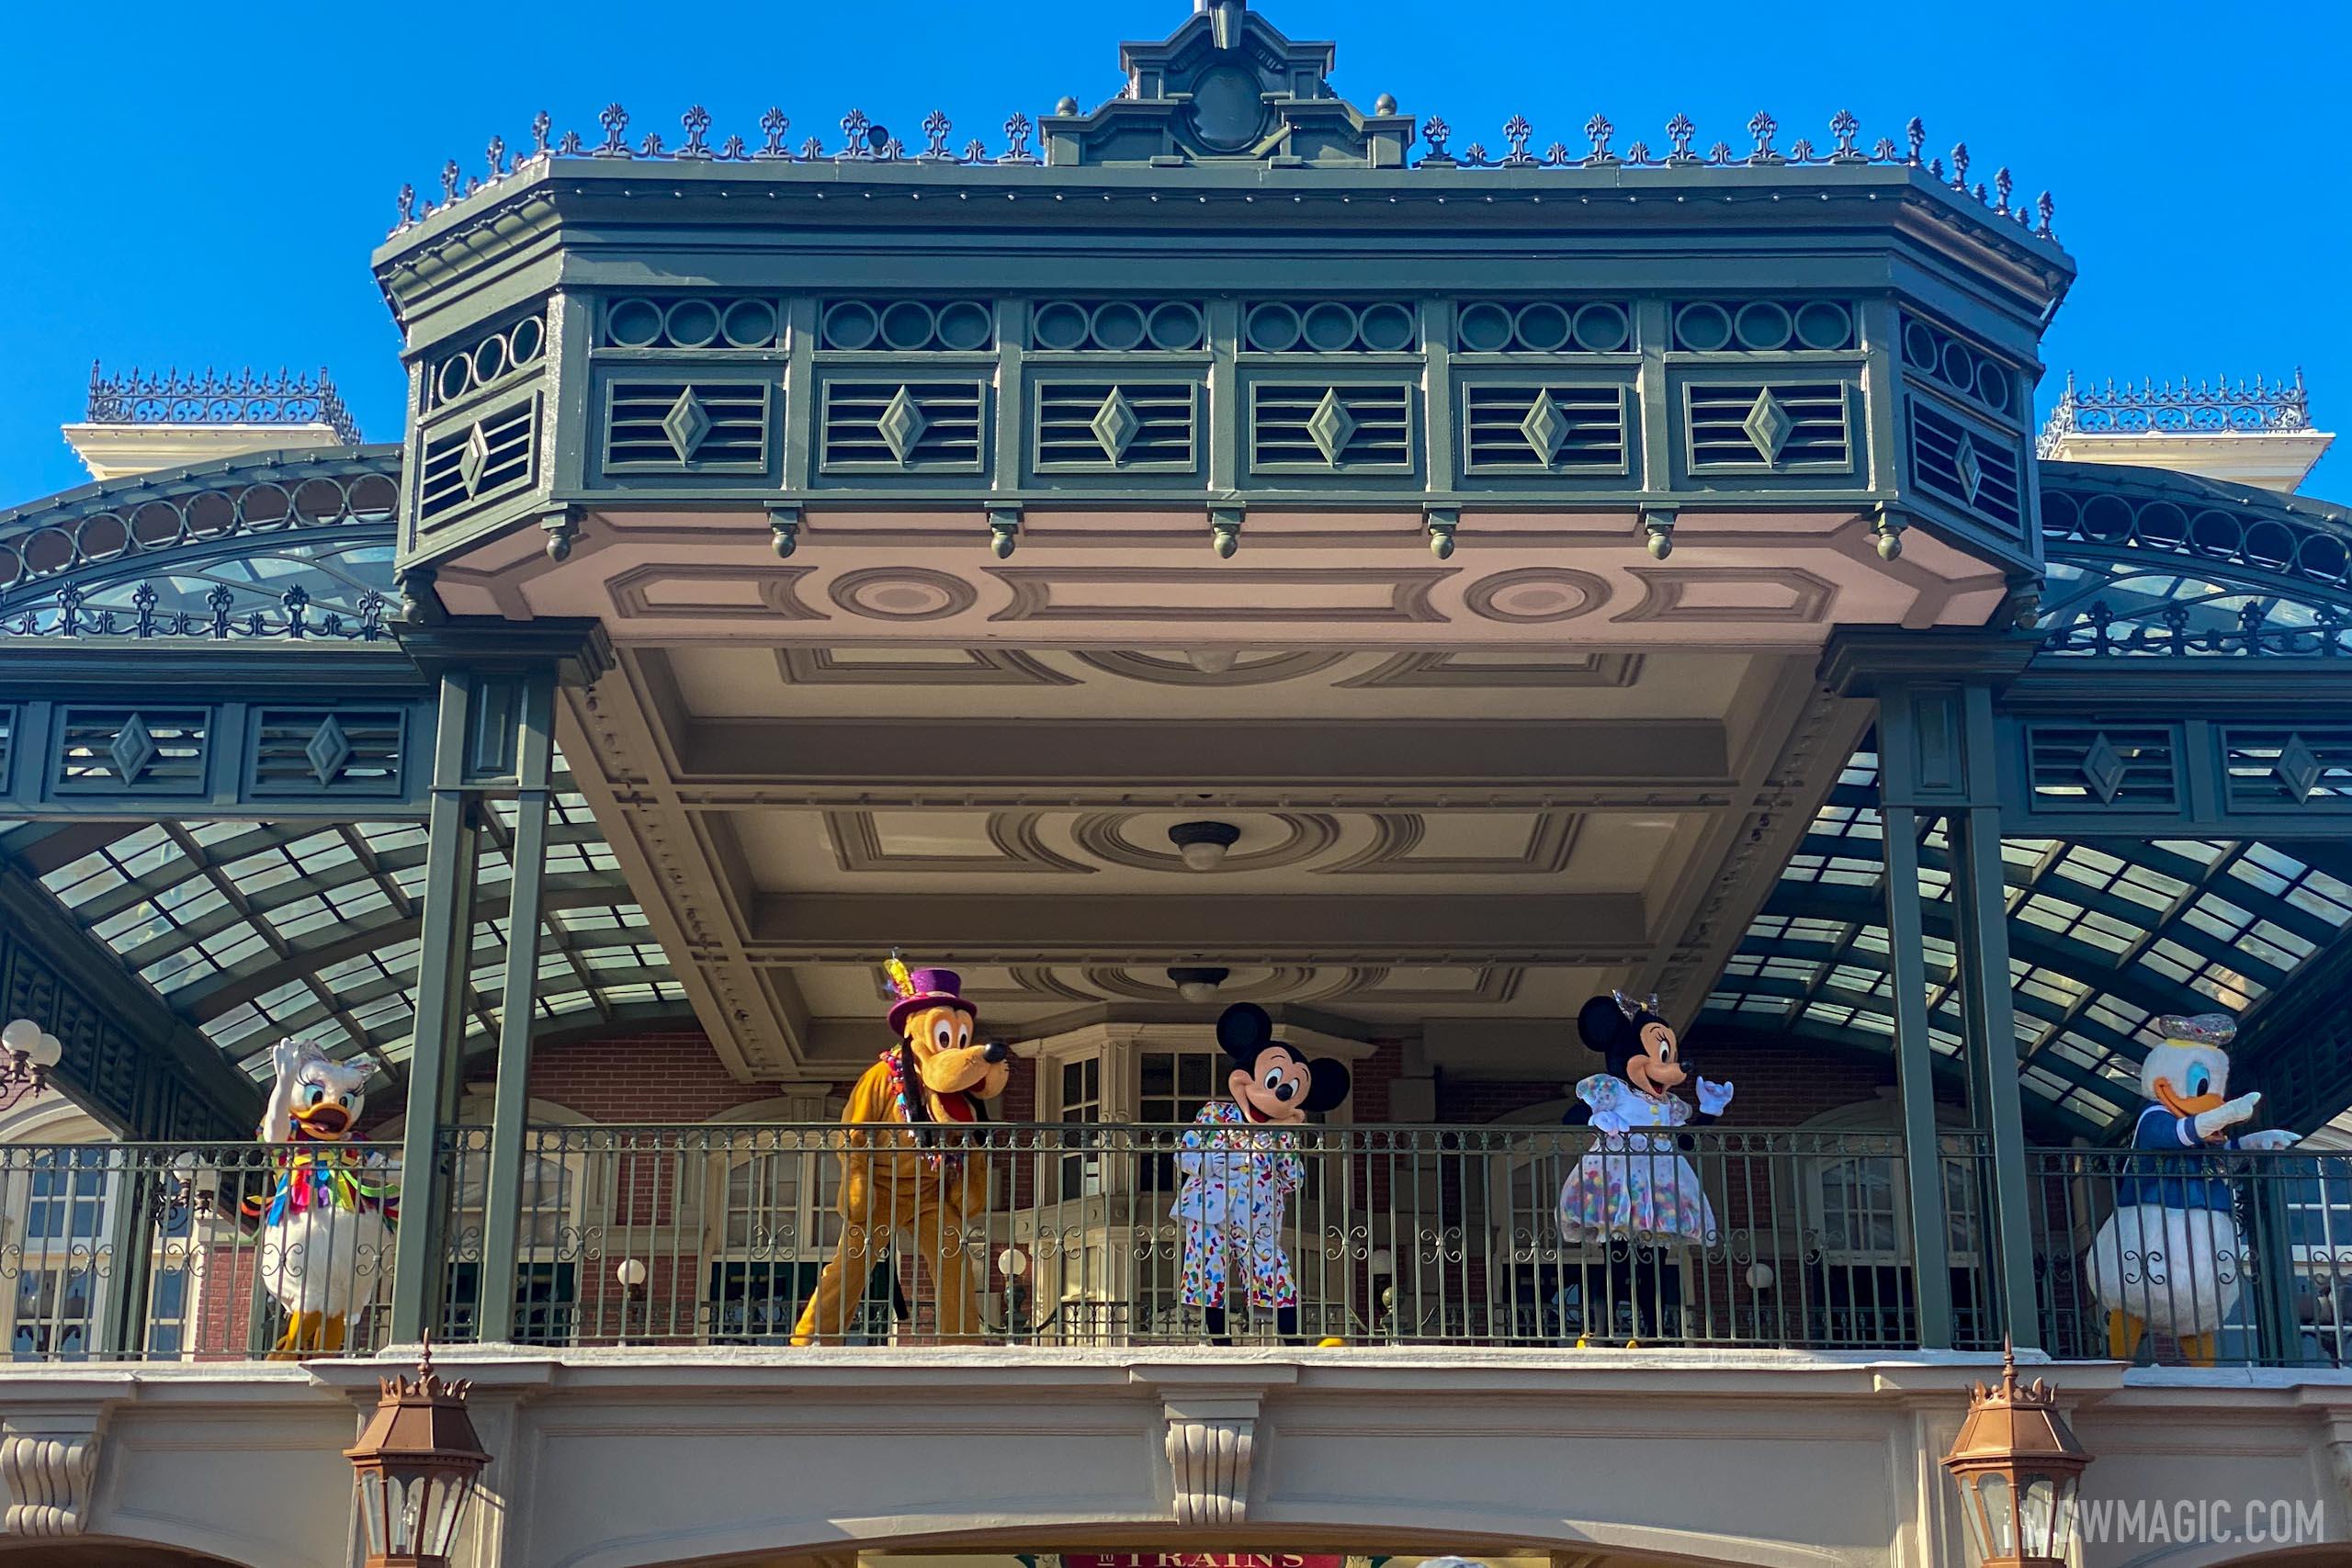 Welcome to Magic Kingdom